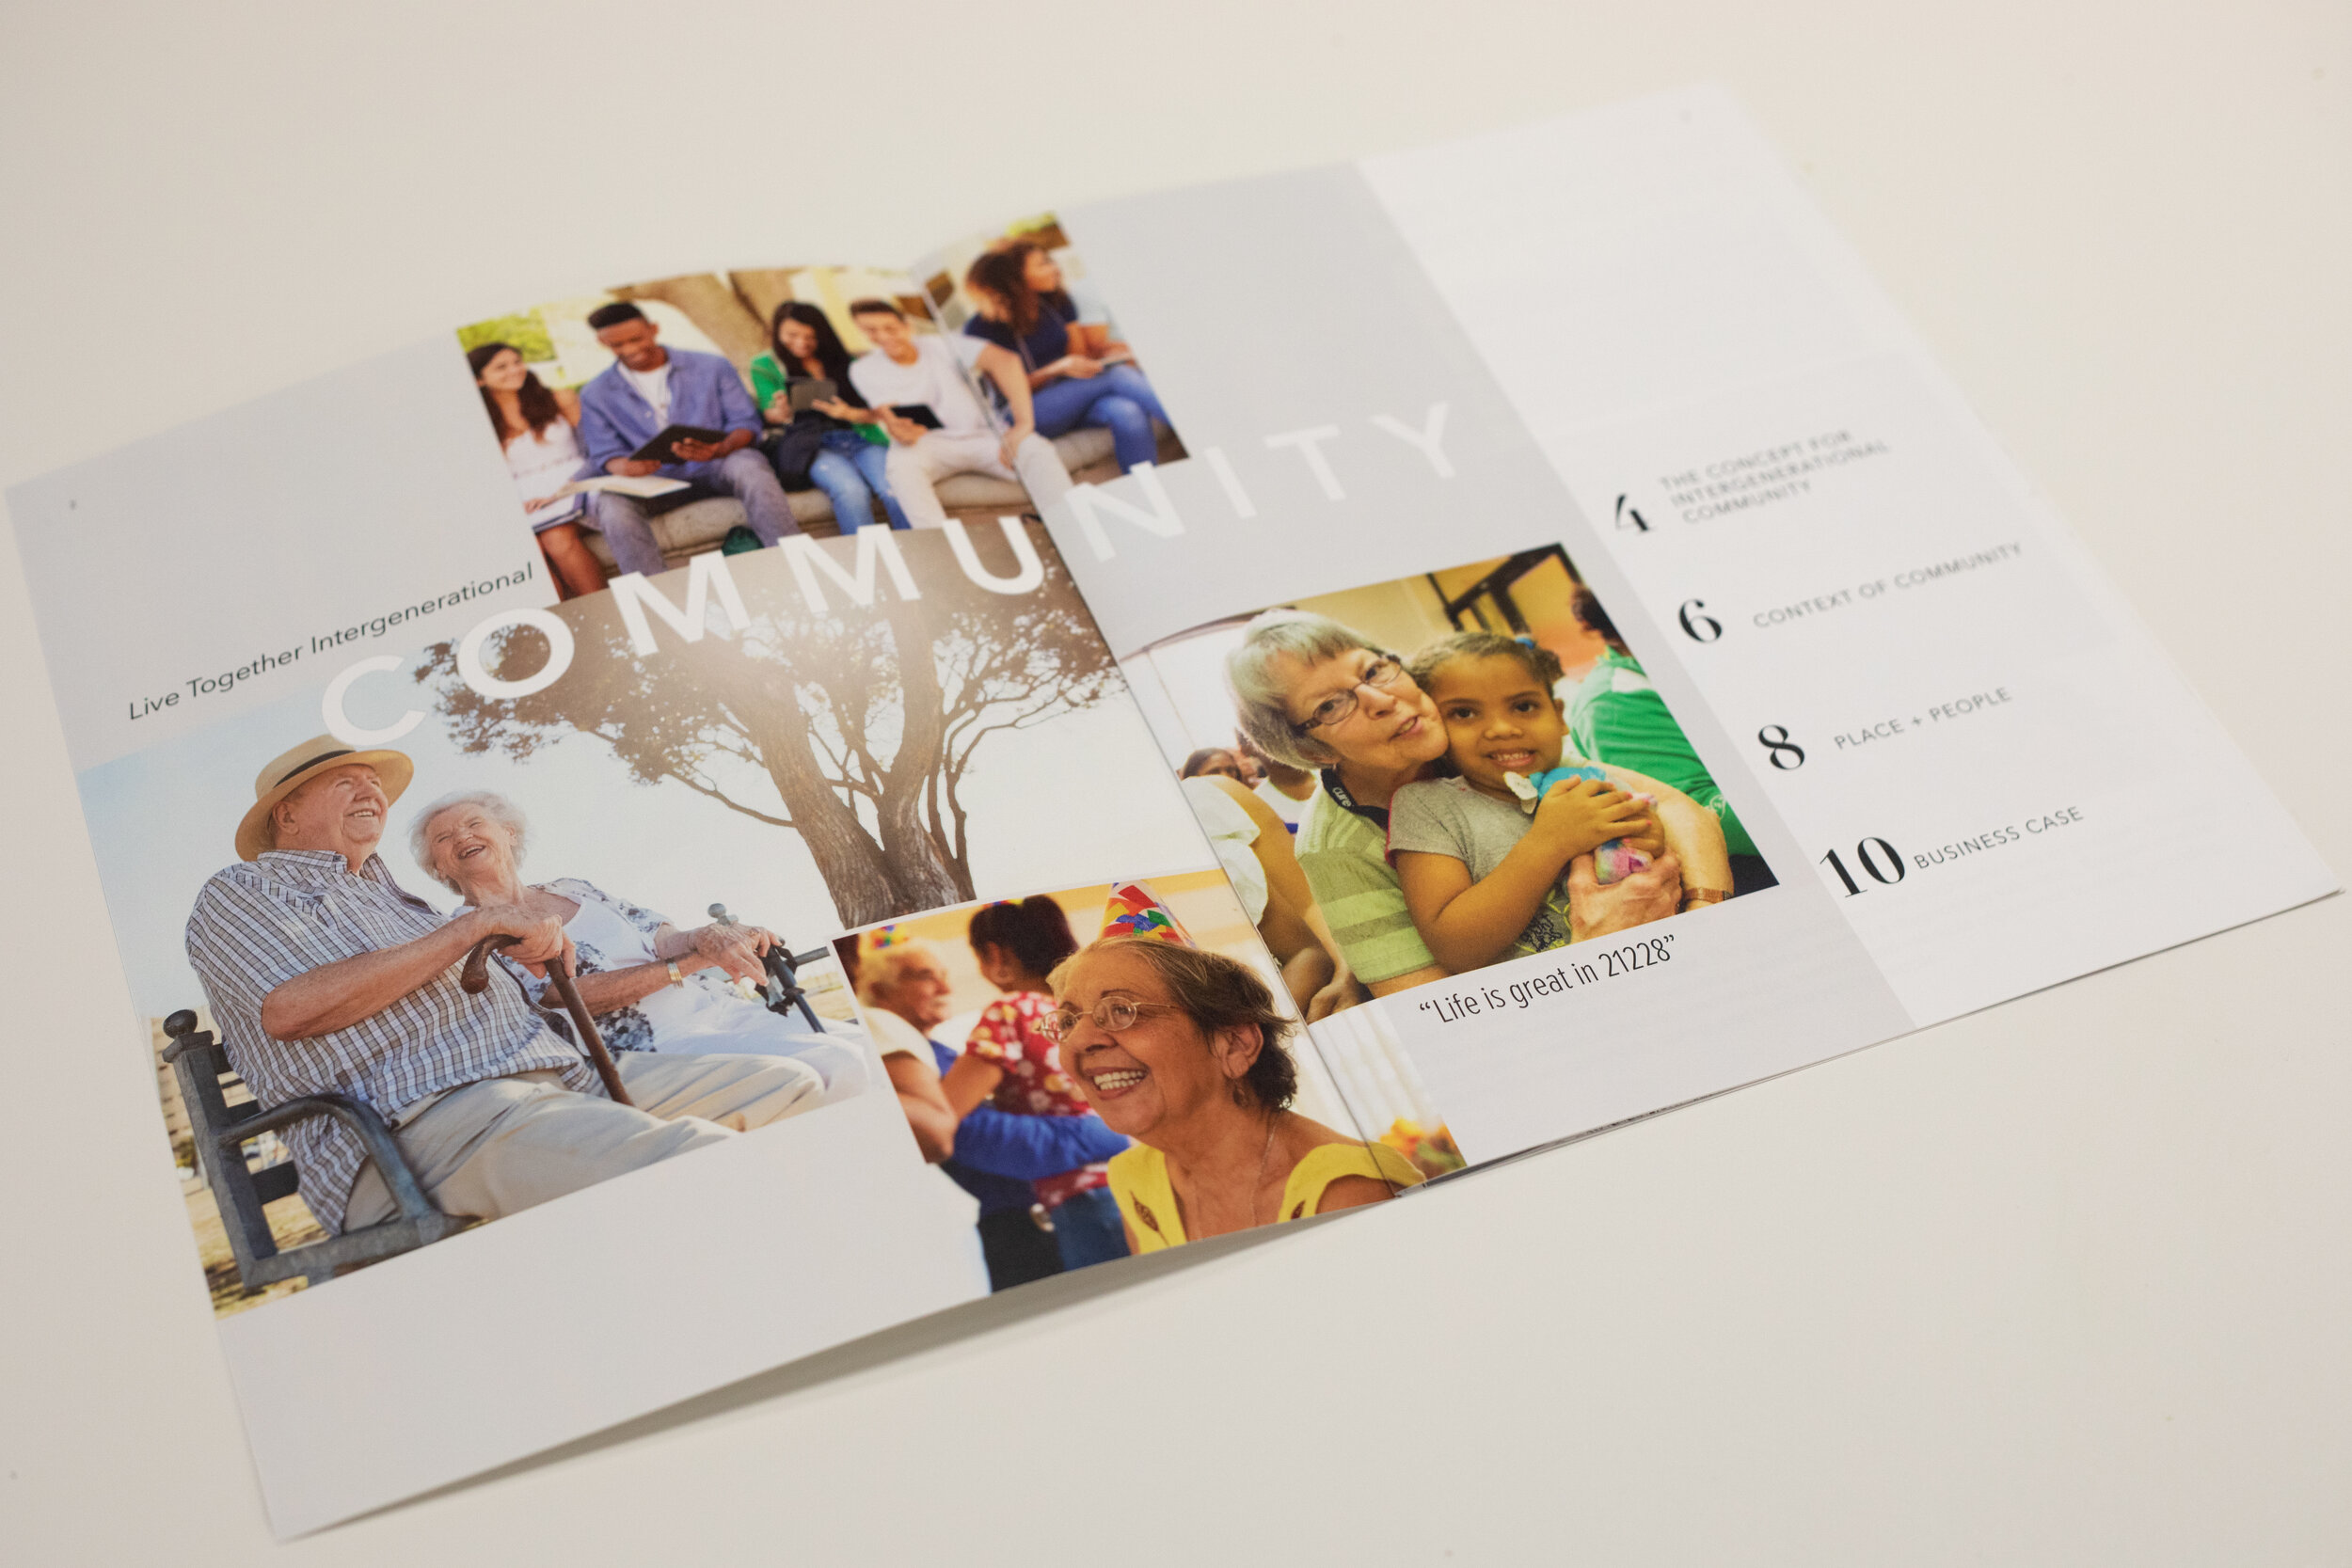 Live Together Intergenerational Community